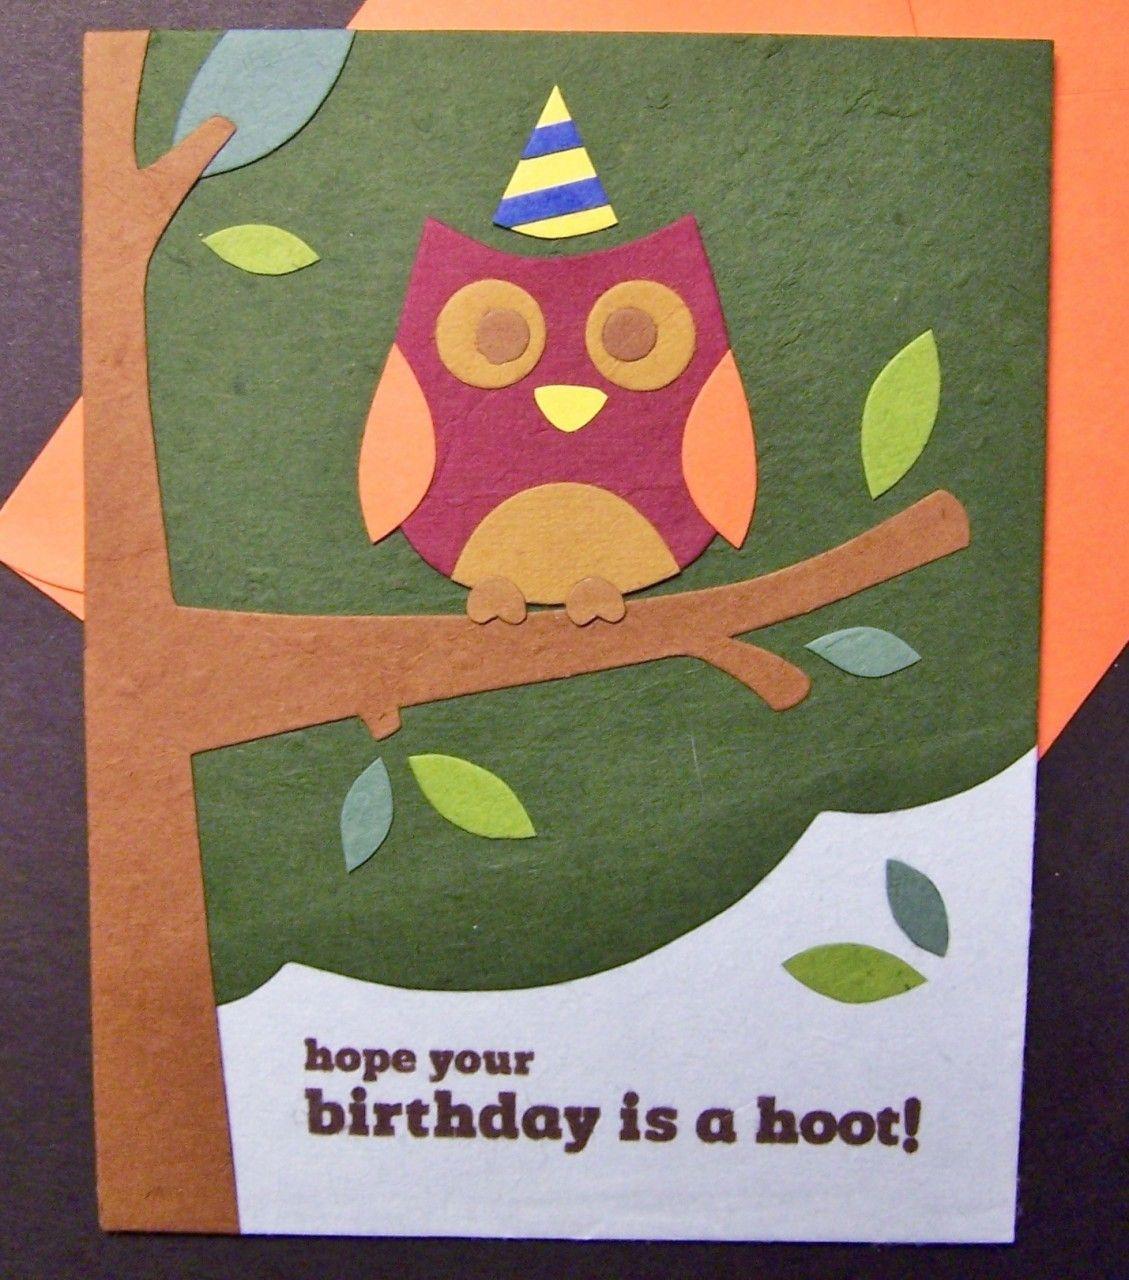 Fair trade designs birthday hoot greeting card 500 httpwww fair trade designs birthday hoot greeting card 500 httpwww m4hsunfo